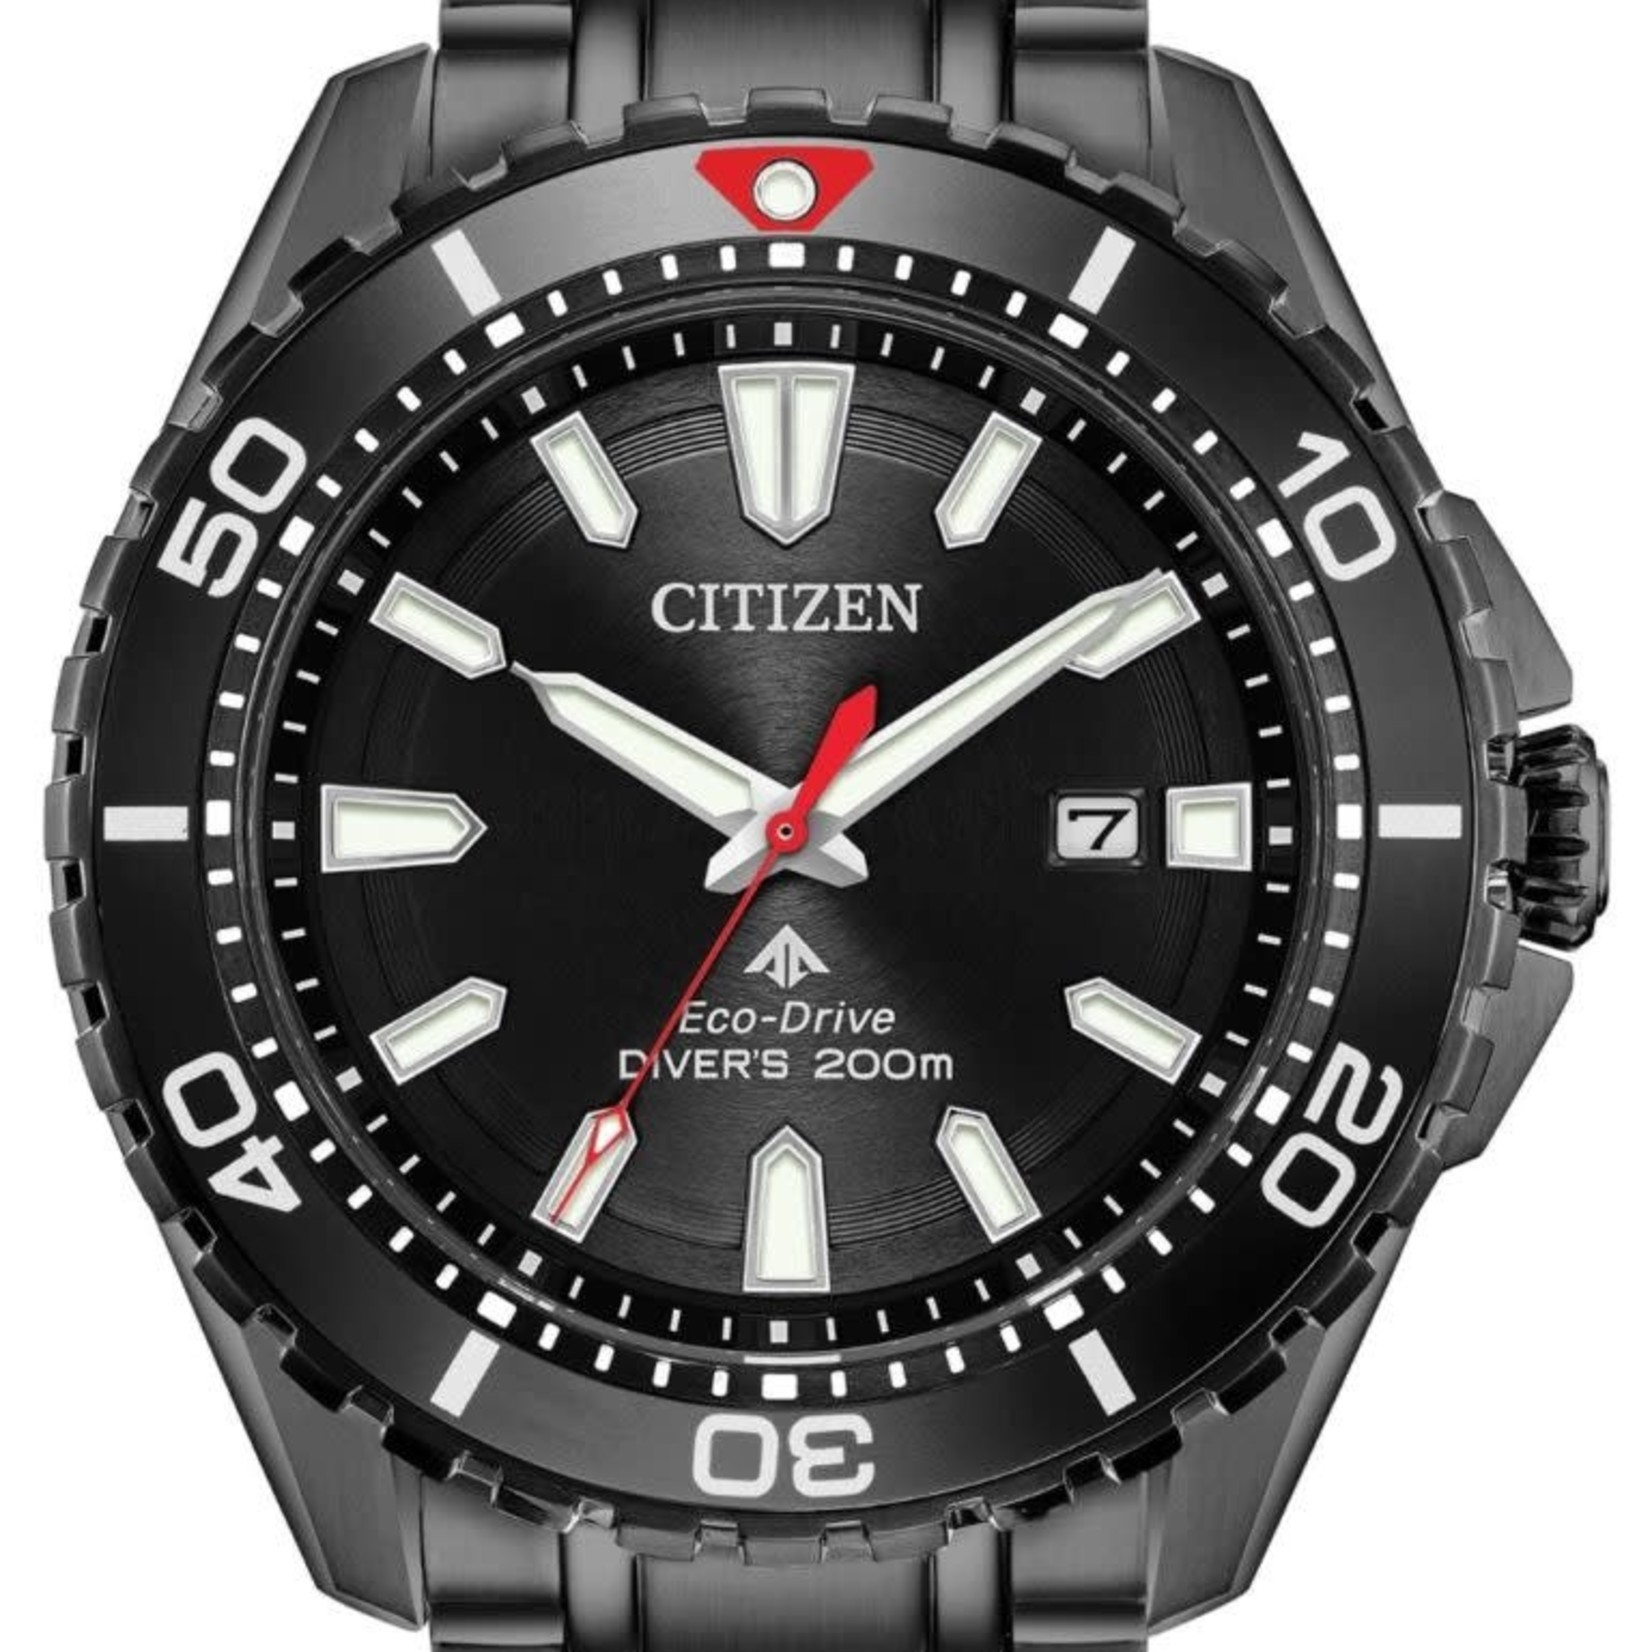 Citizen Men's ECO Drive Watch BN195-54E